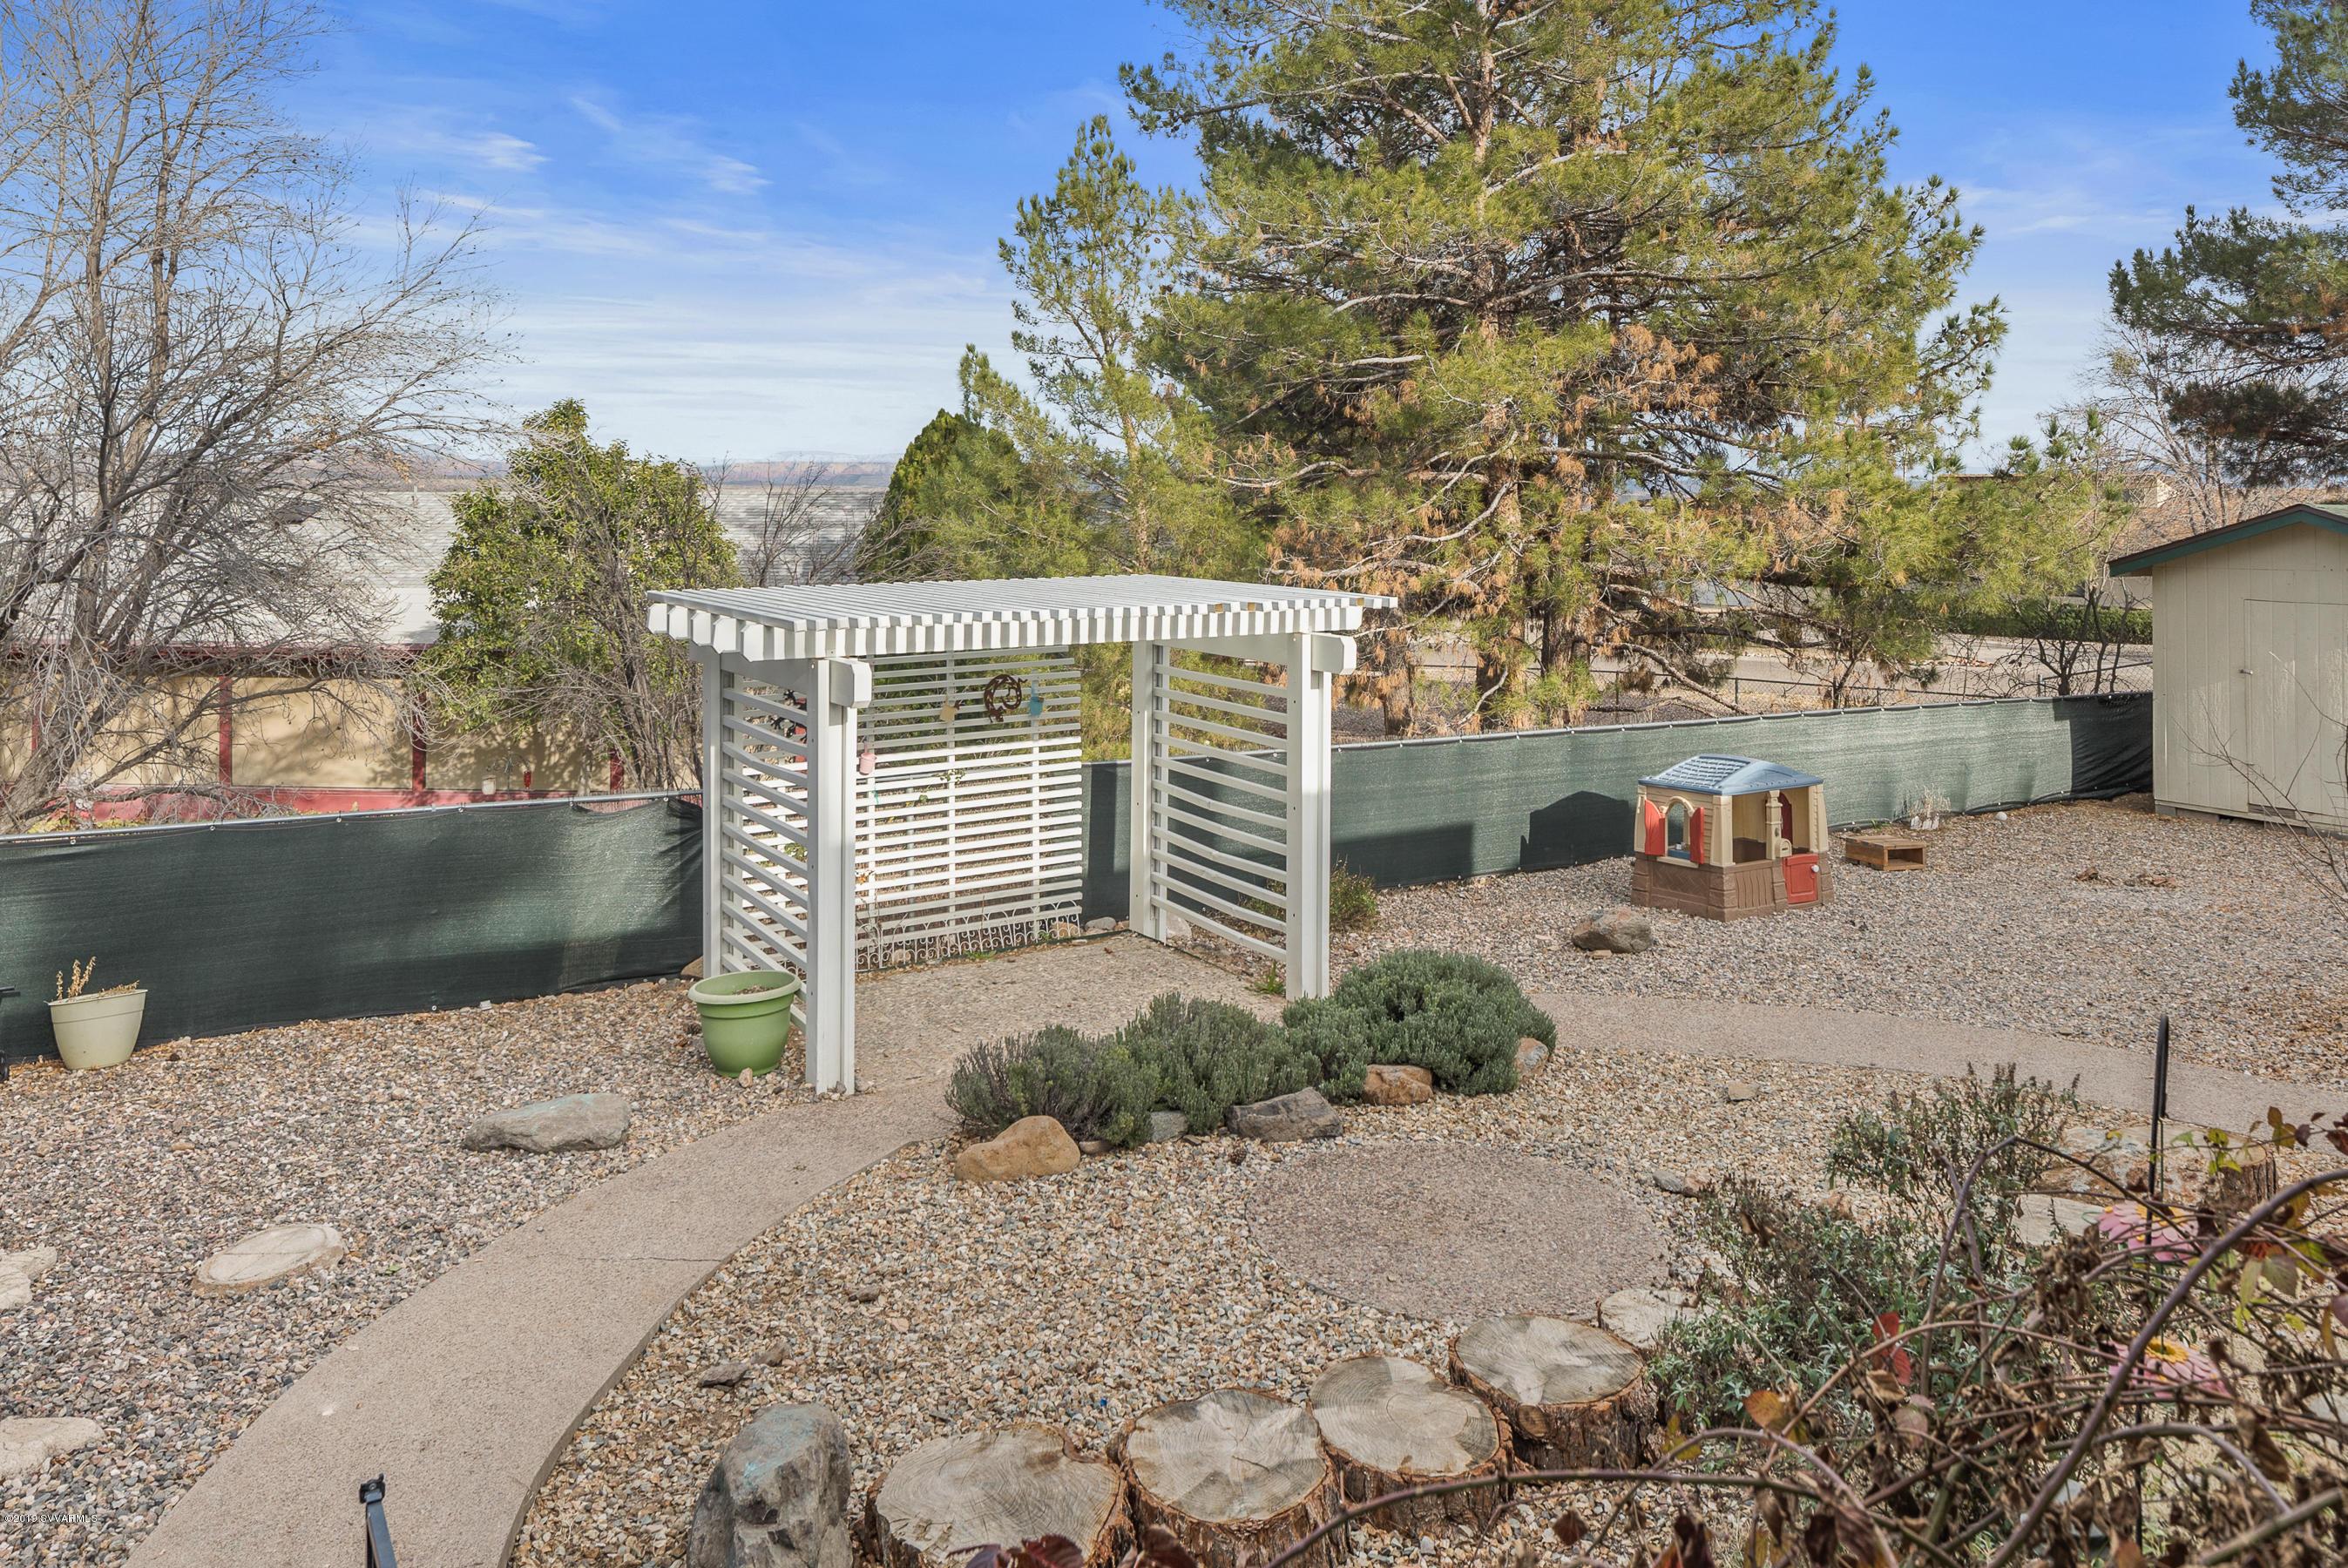 2191 Old Jerome Hwy Clarkdale, AZ 86324